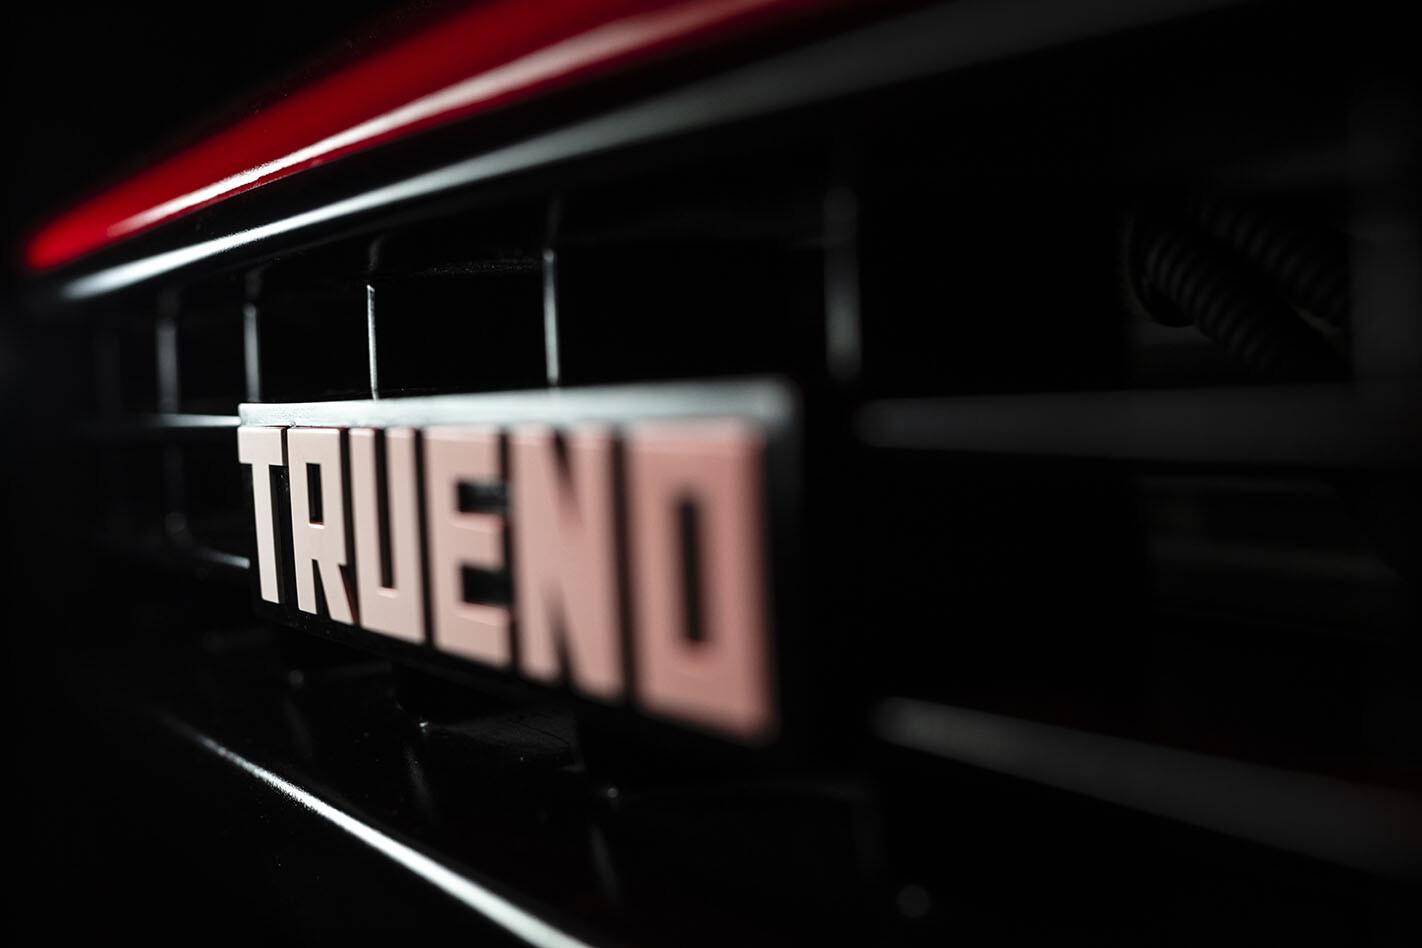 Toyota AE86 Trueno badge